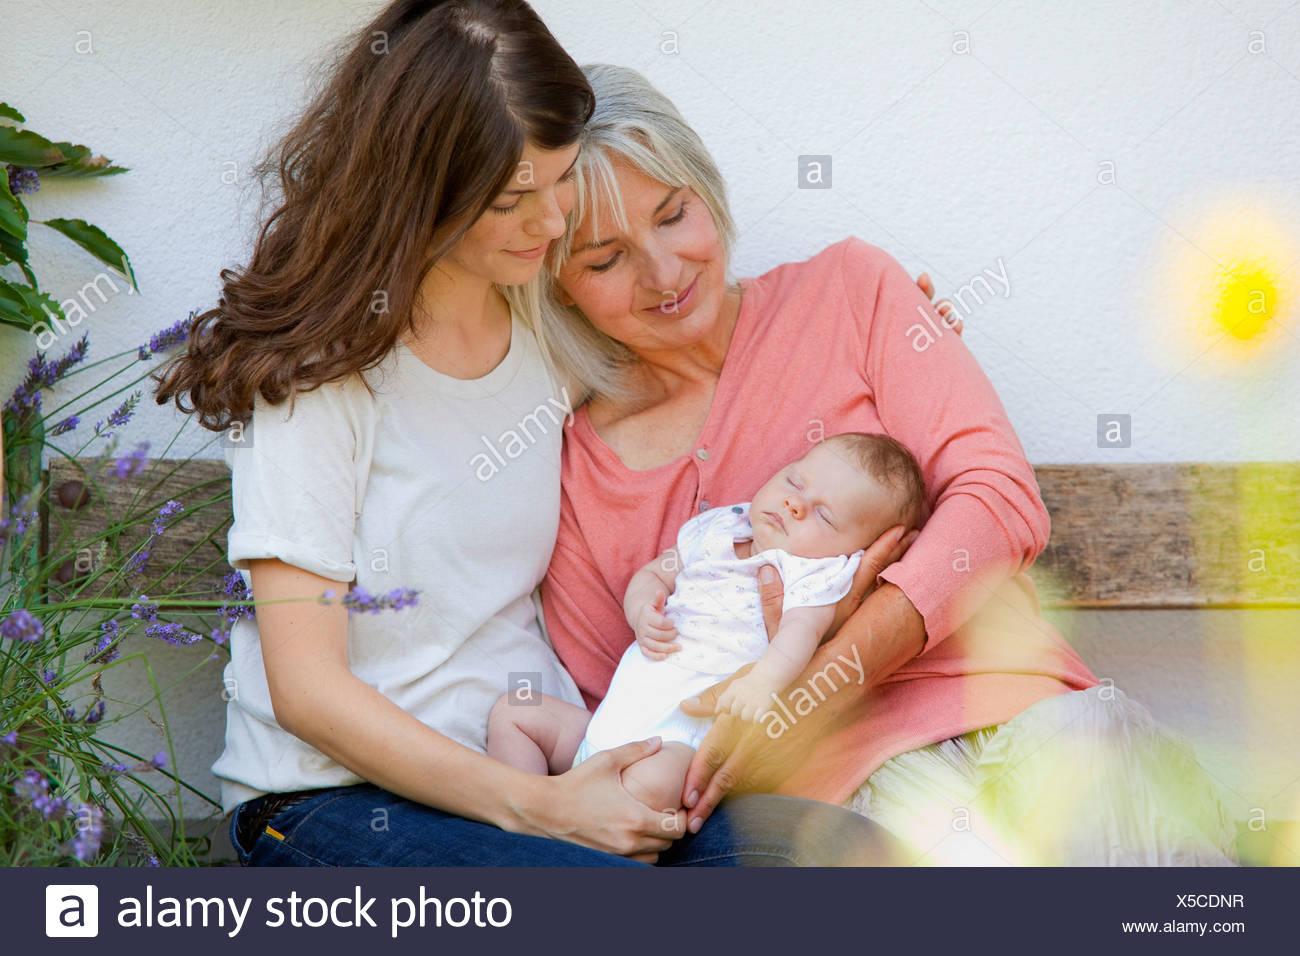 Germany, Bavaria, Three generations sitting together - Stock Image